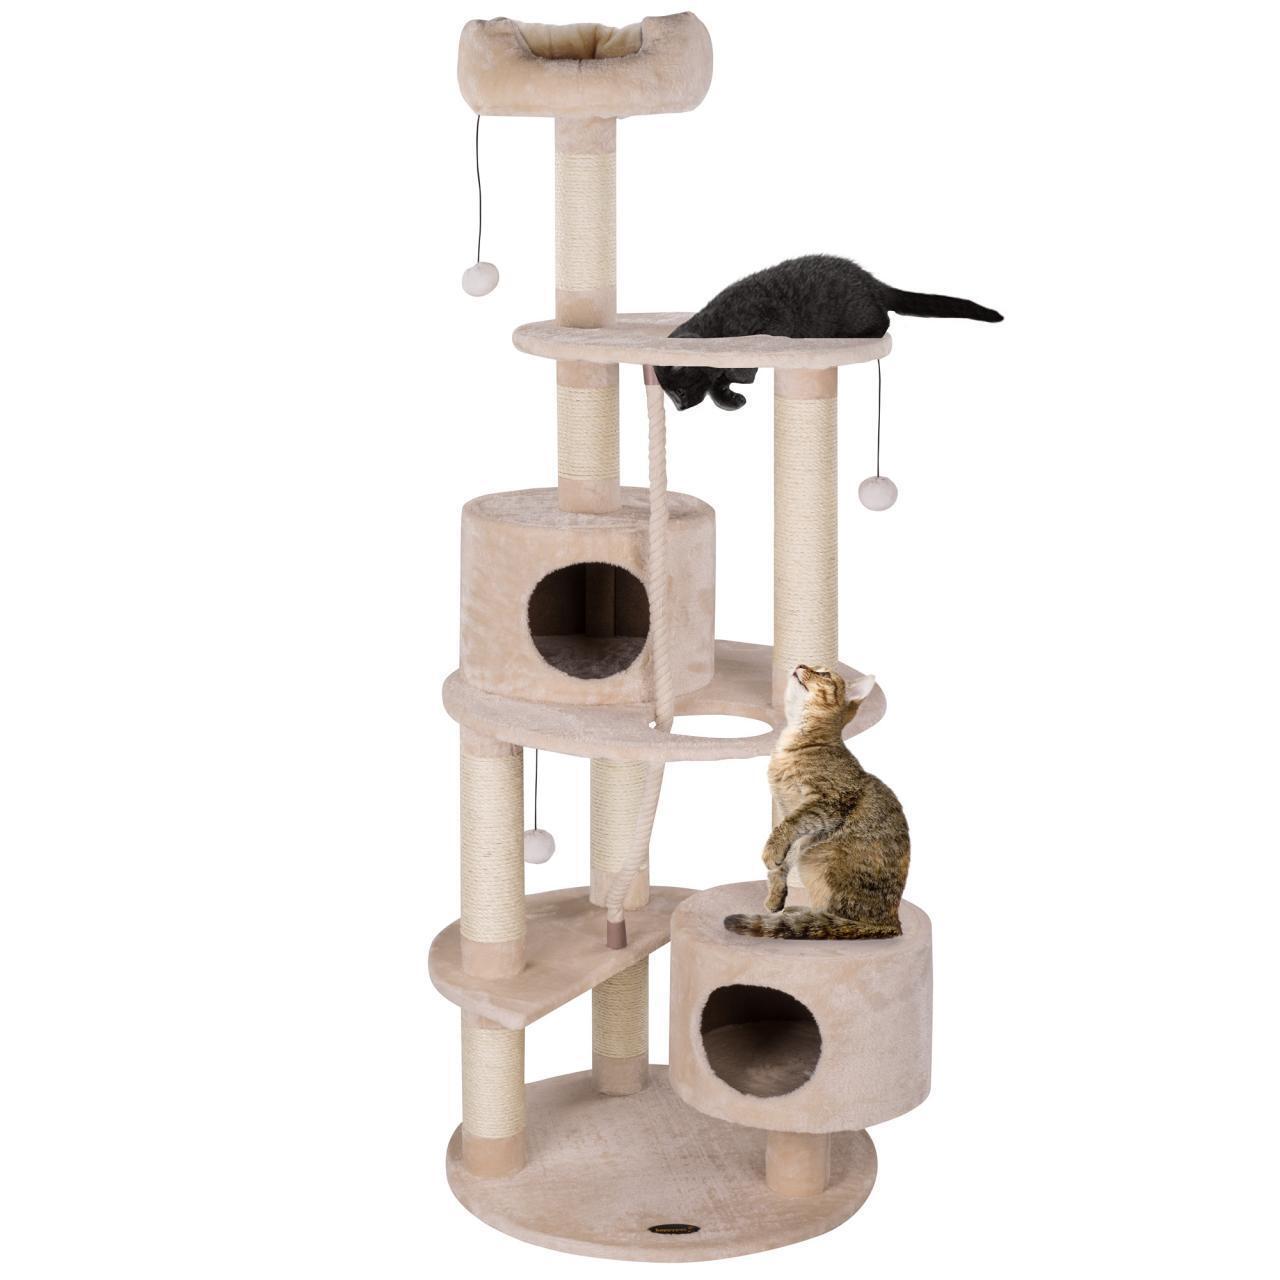 Happypet ® Tiragraffi Tiragraffi per gatti arrampicarsi Sisal dimensioni medie TONDO 170cm Beige